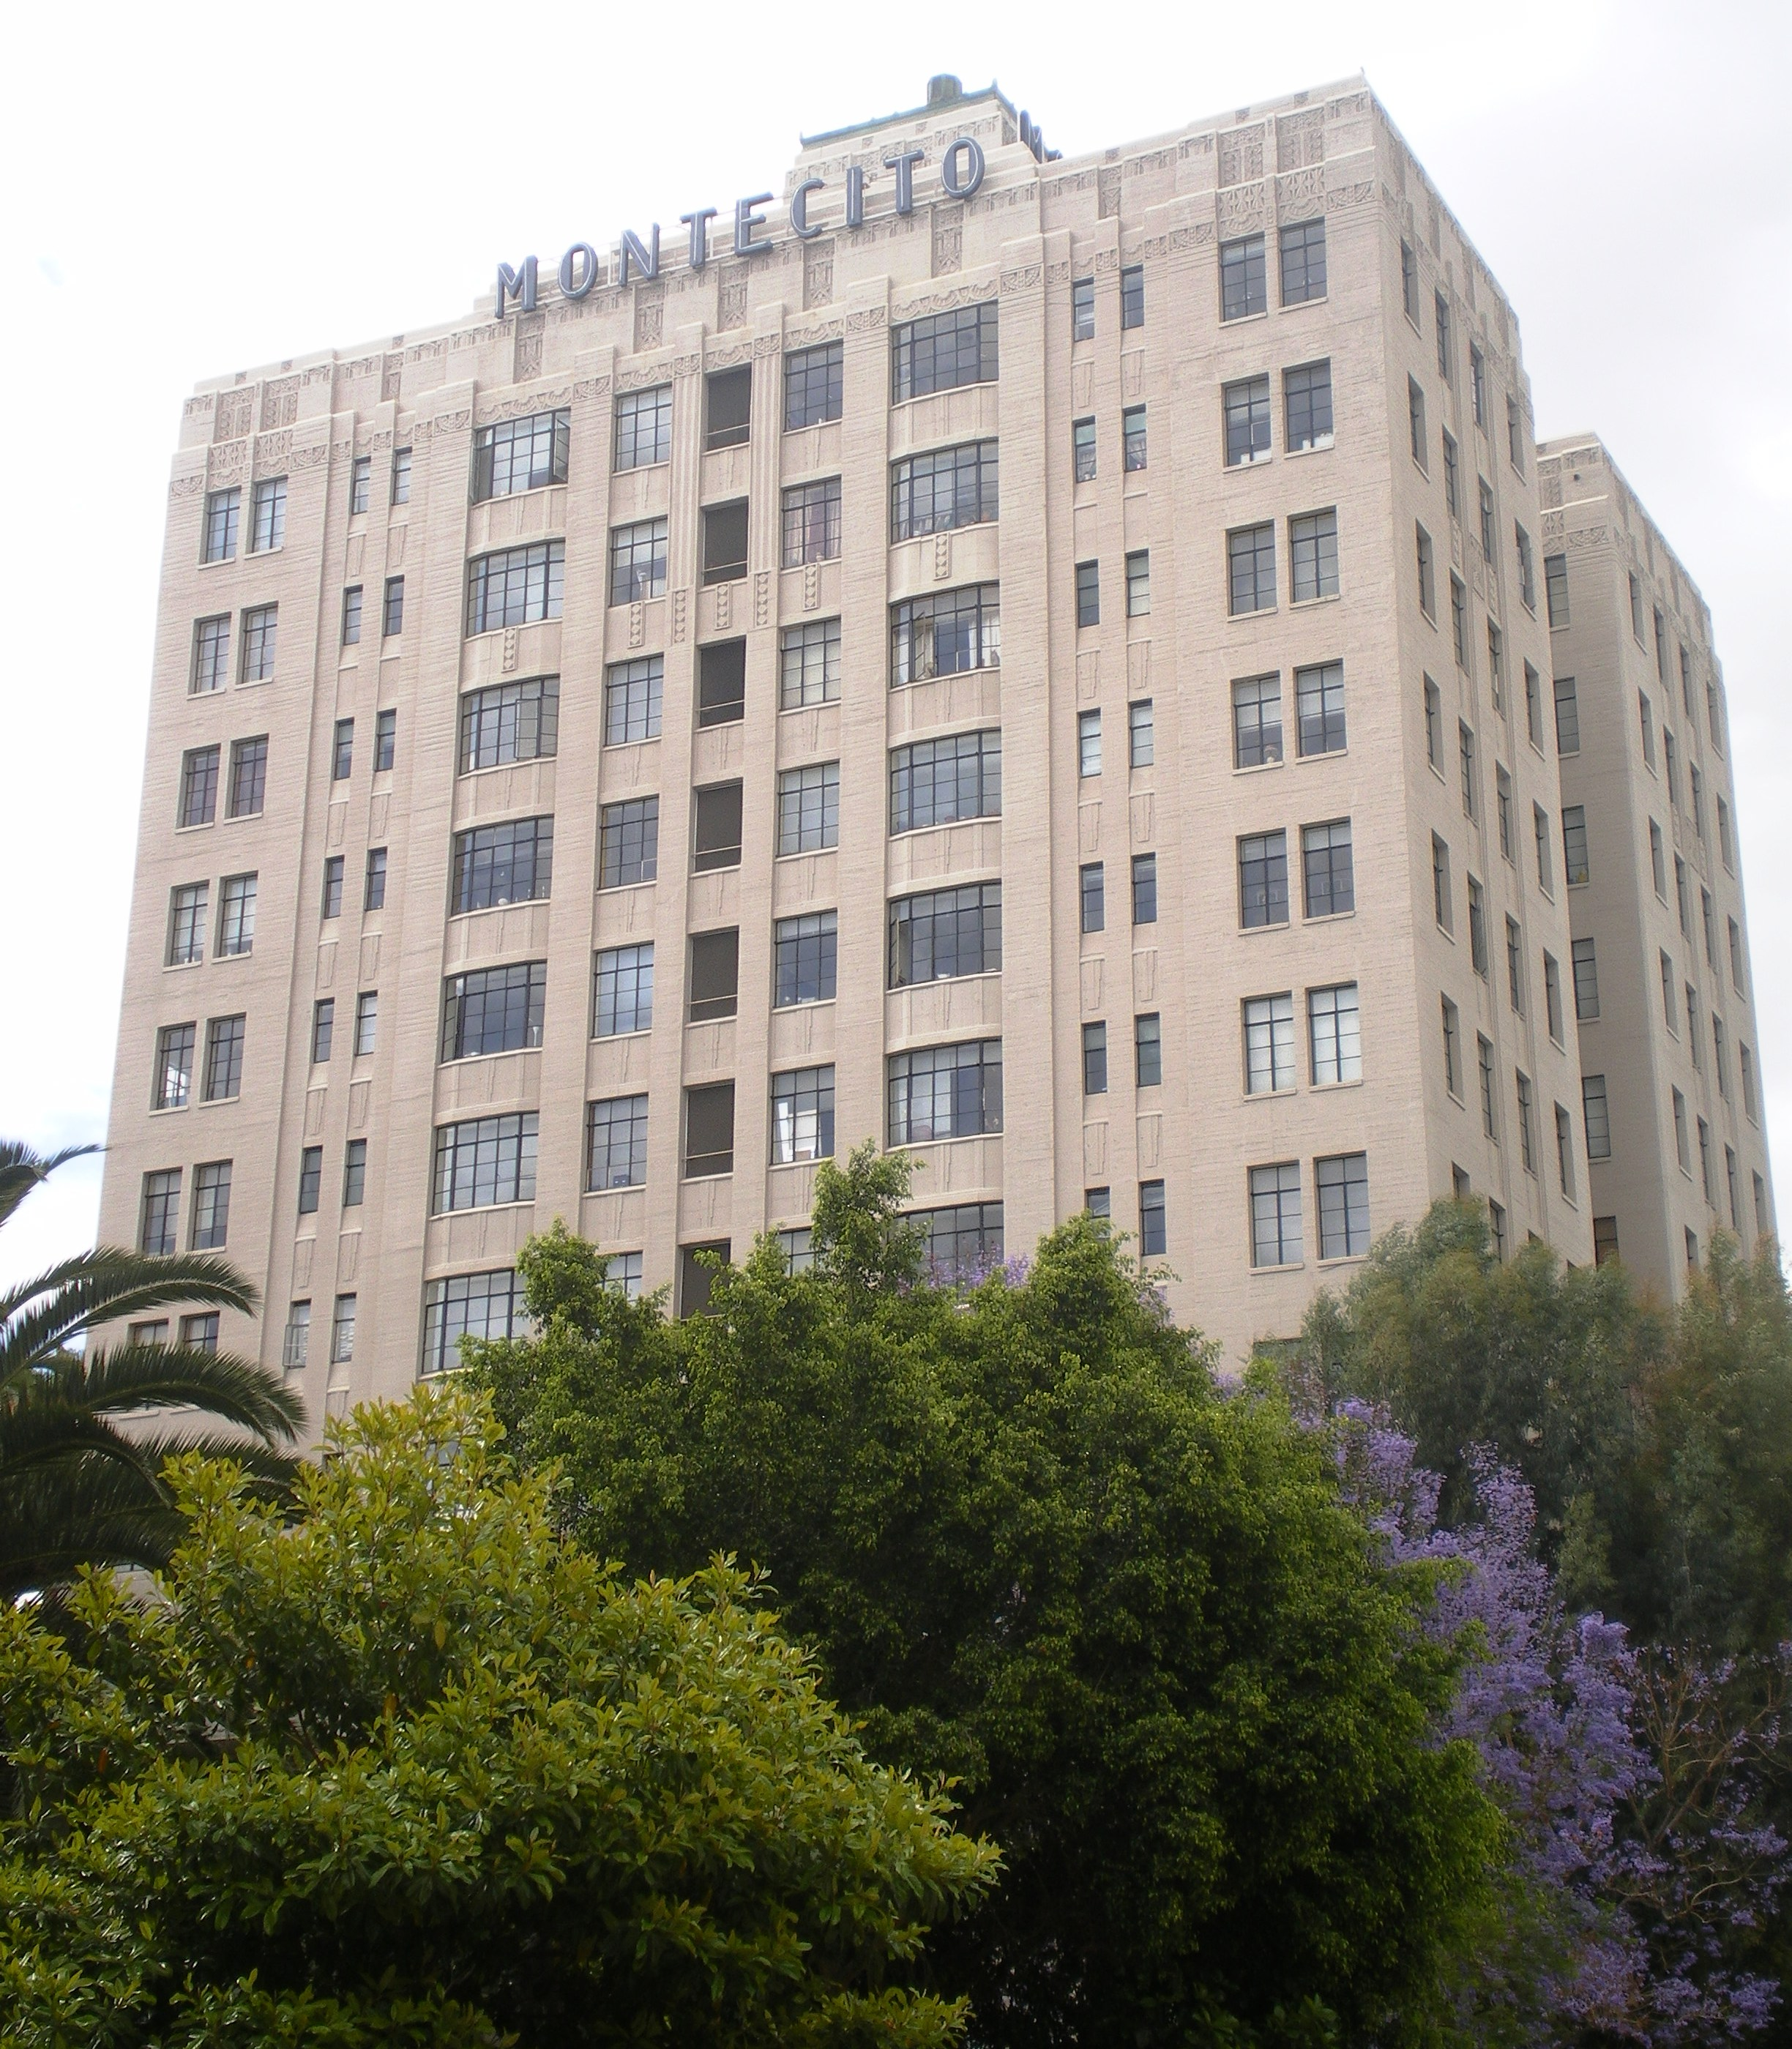 The Montecito Apartments Woodland Hills